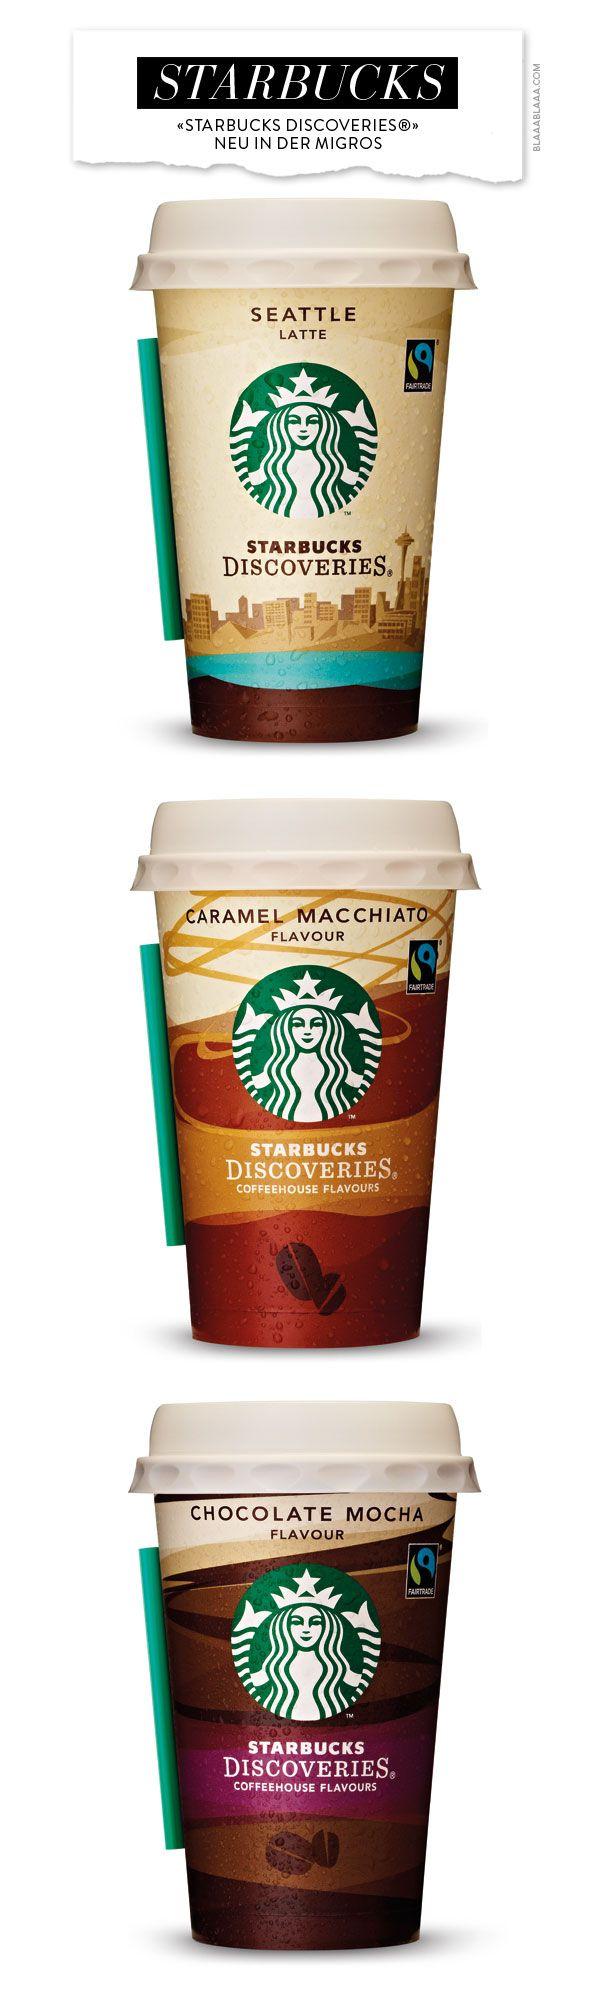 Starbucks Discoveries® @ Migros